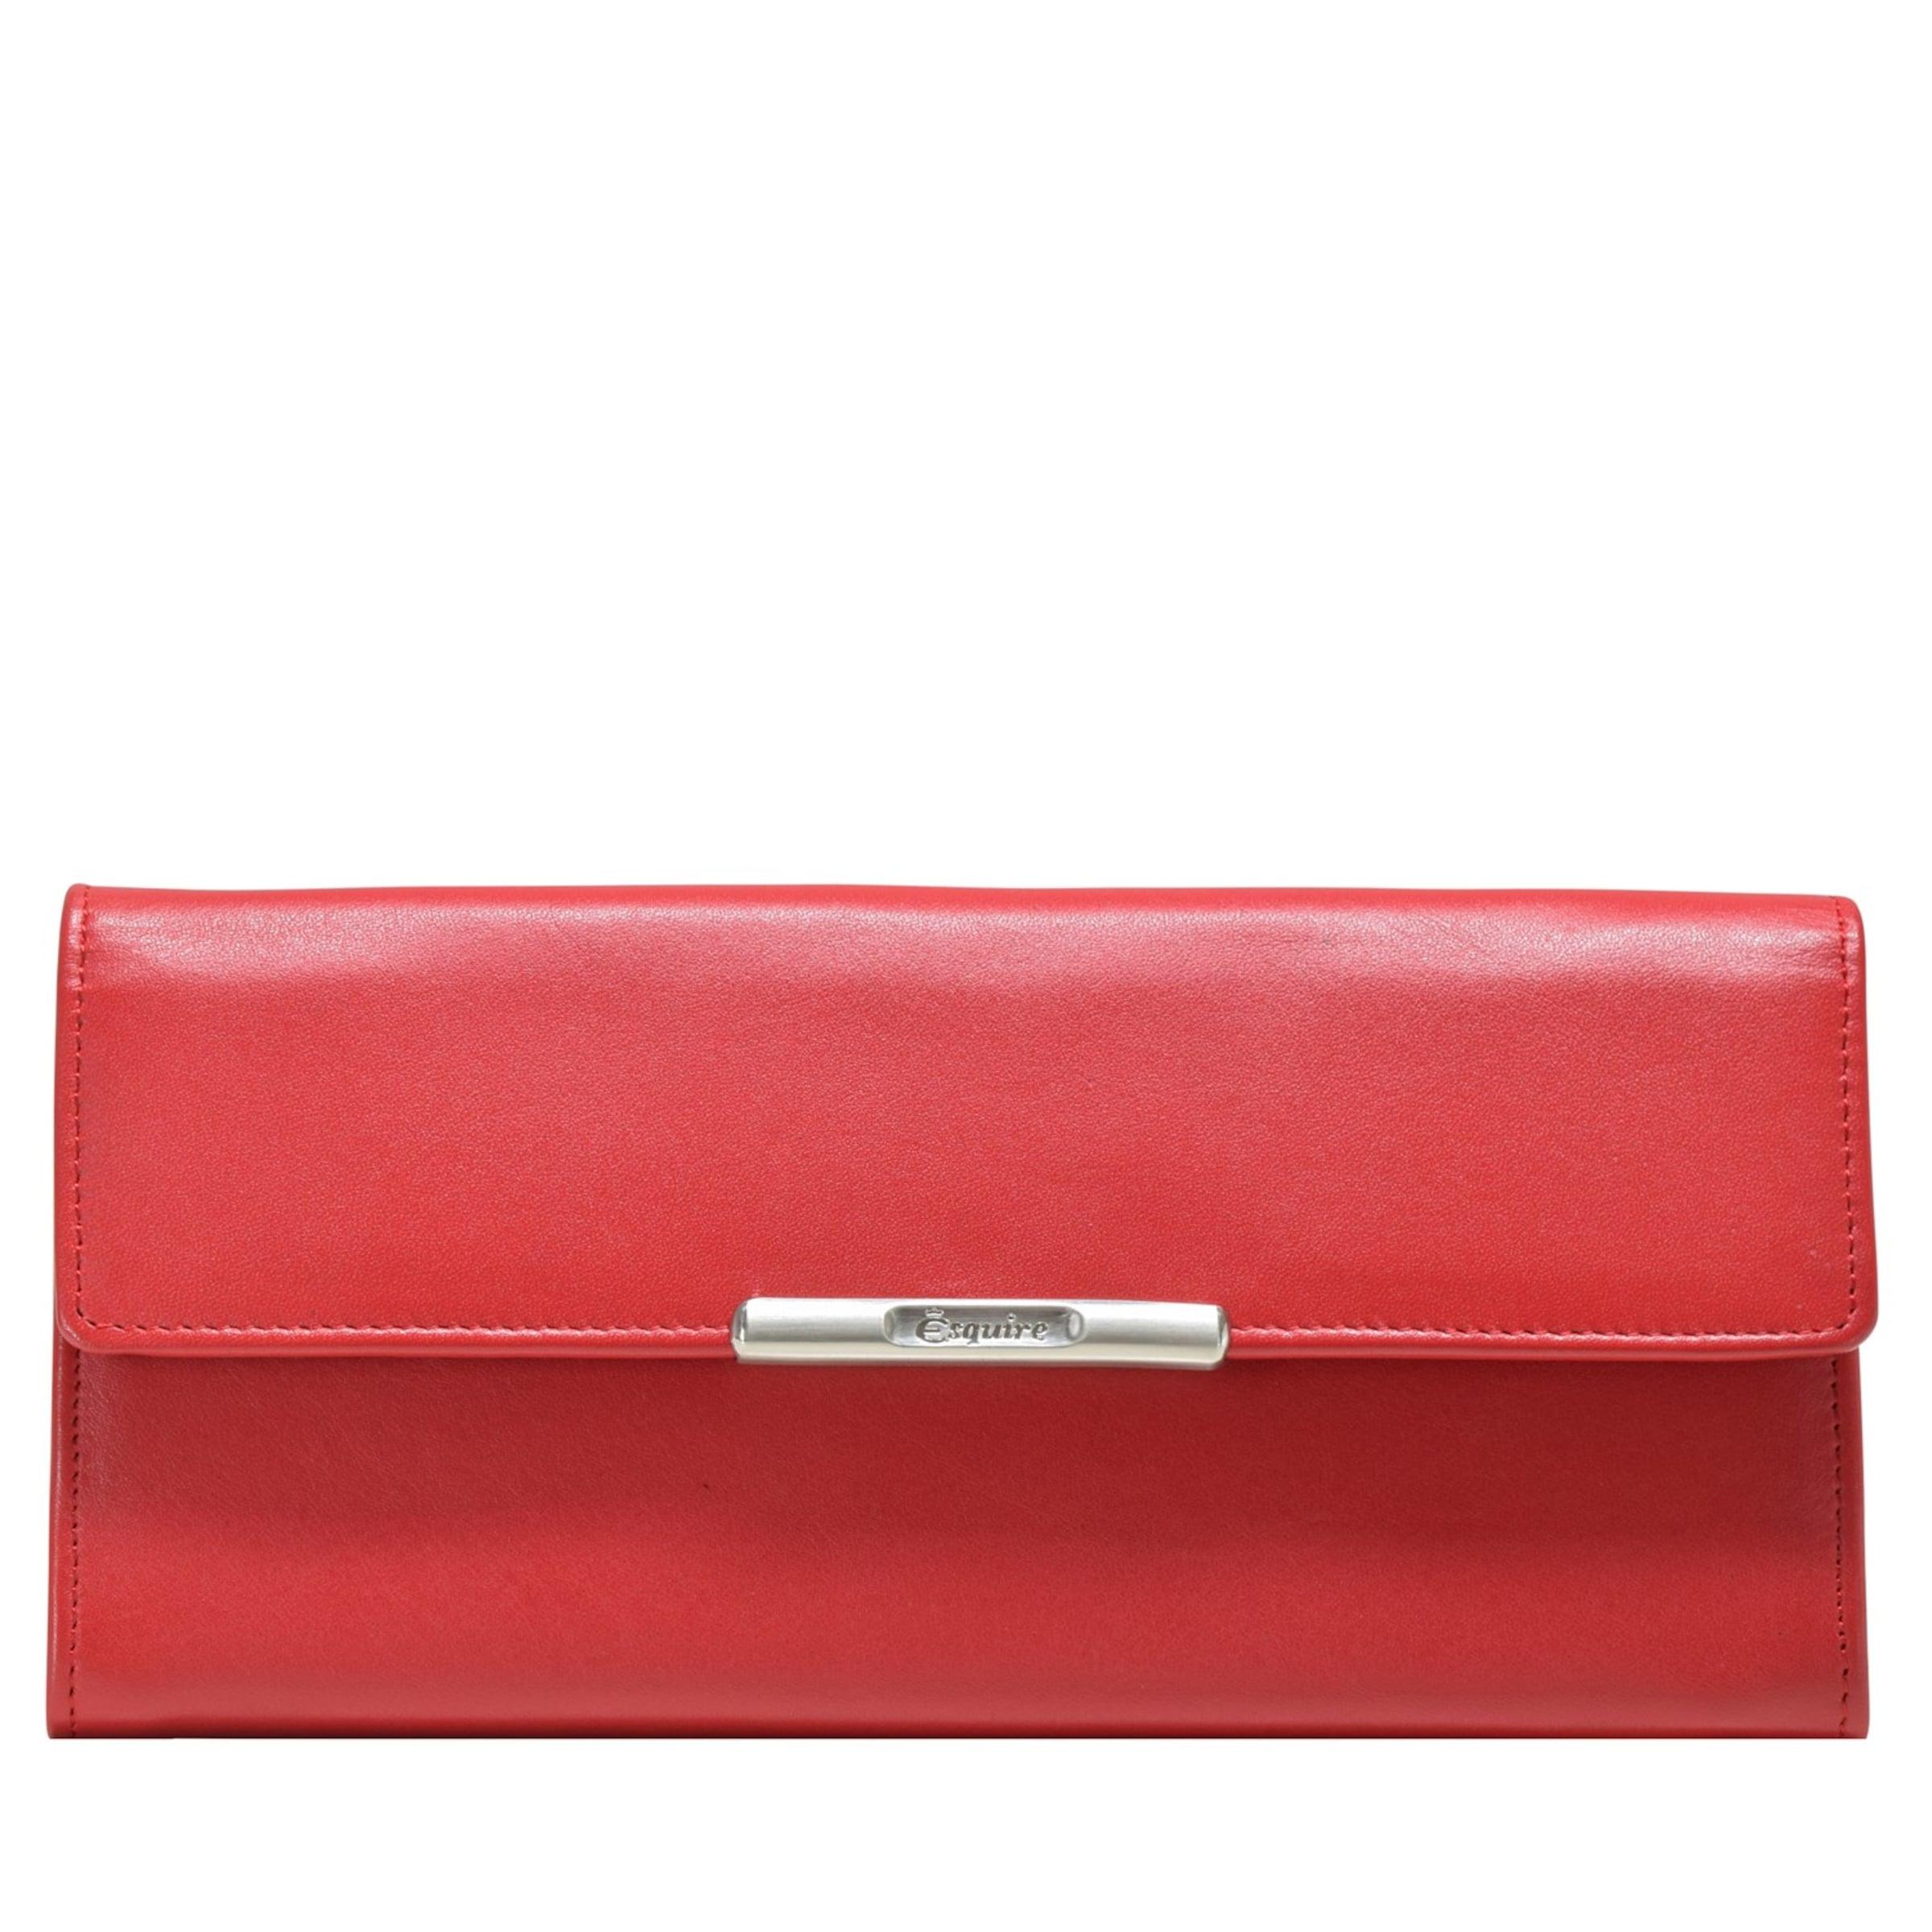 Rouge En Esquire Porte 'helena' monnaies vmO8N0wn